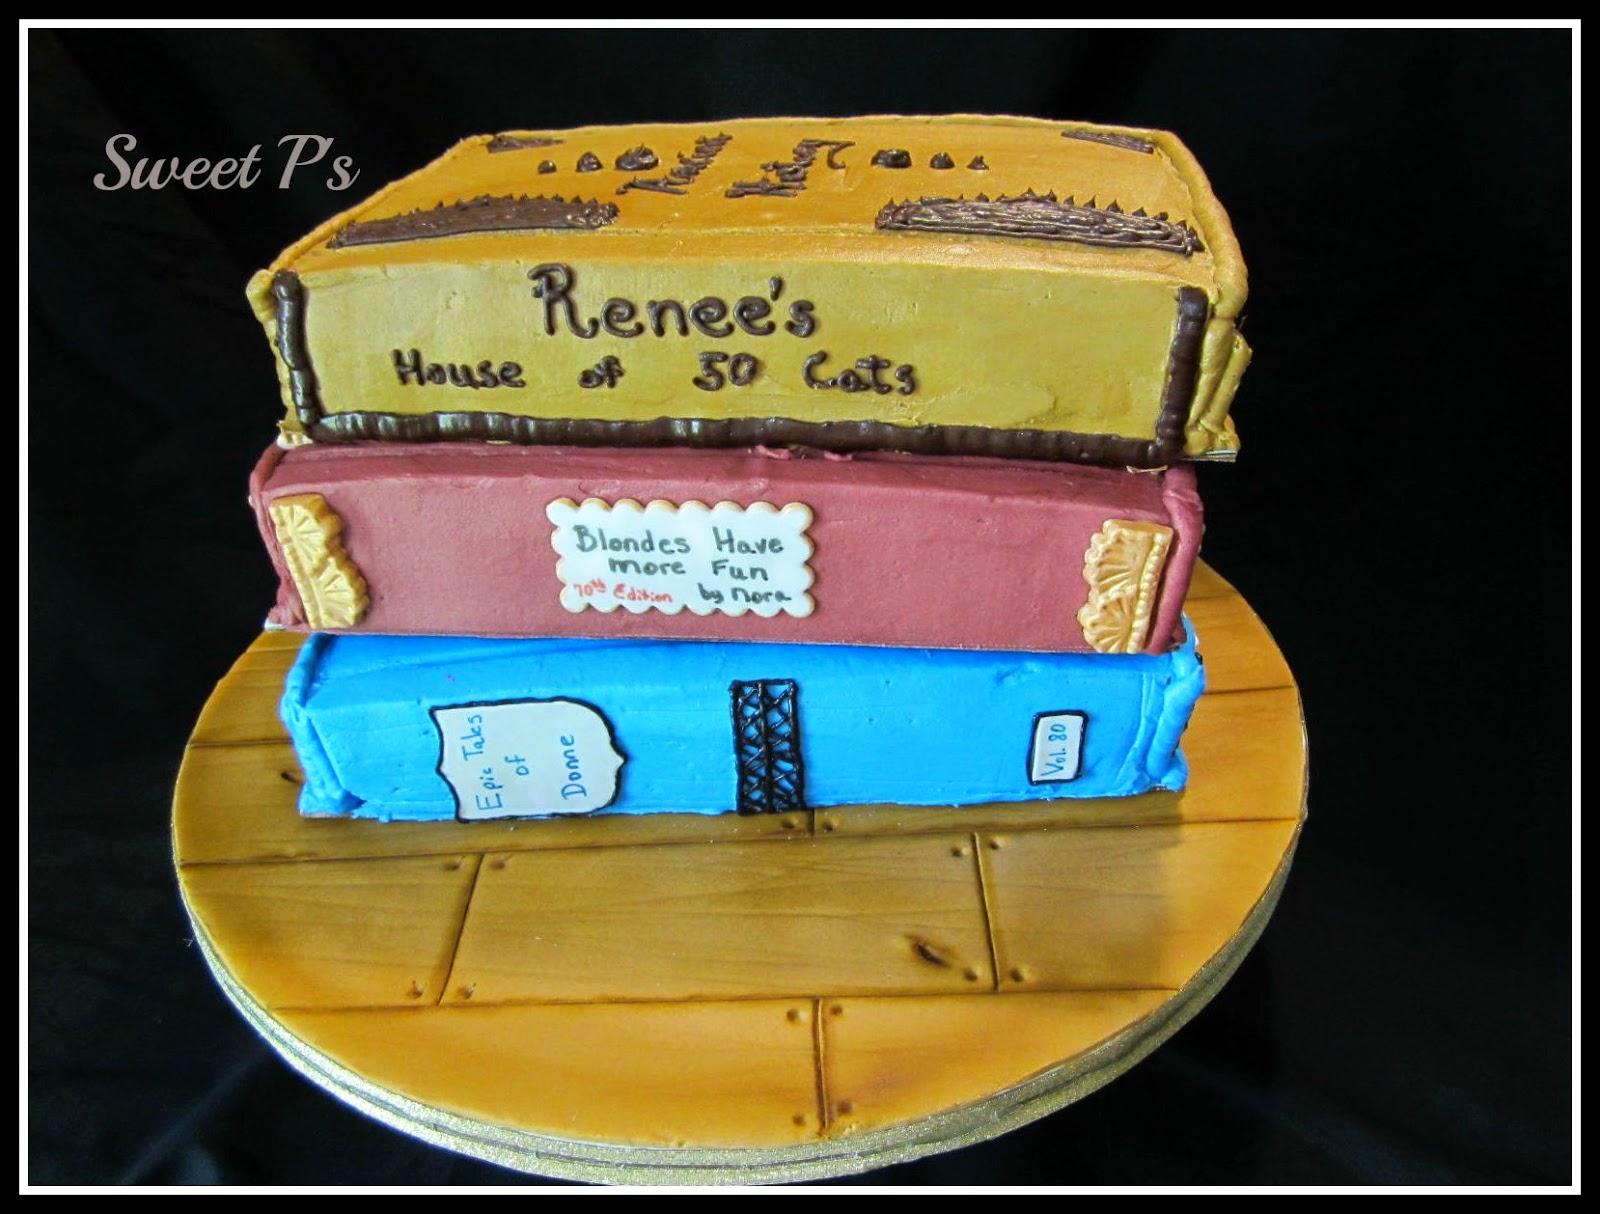 airbrushed fondant cake board